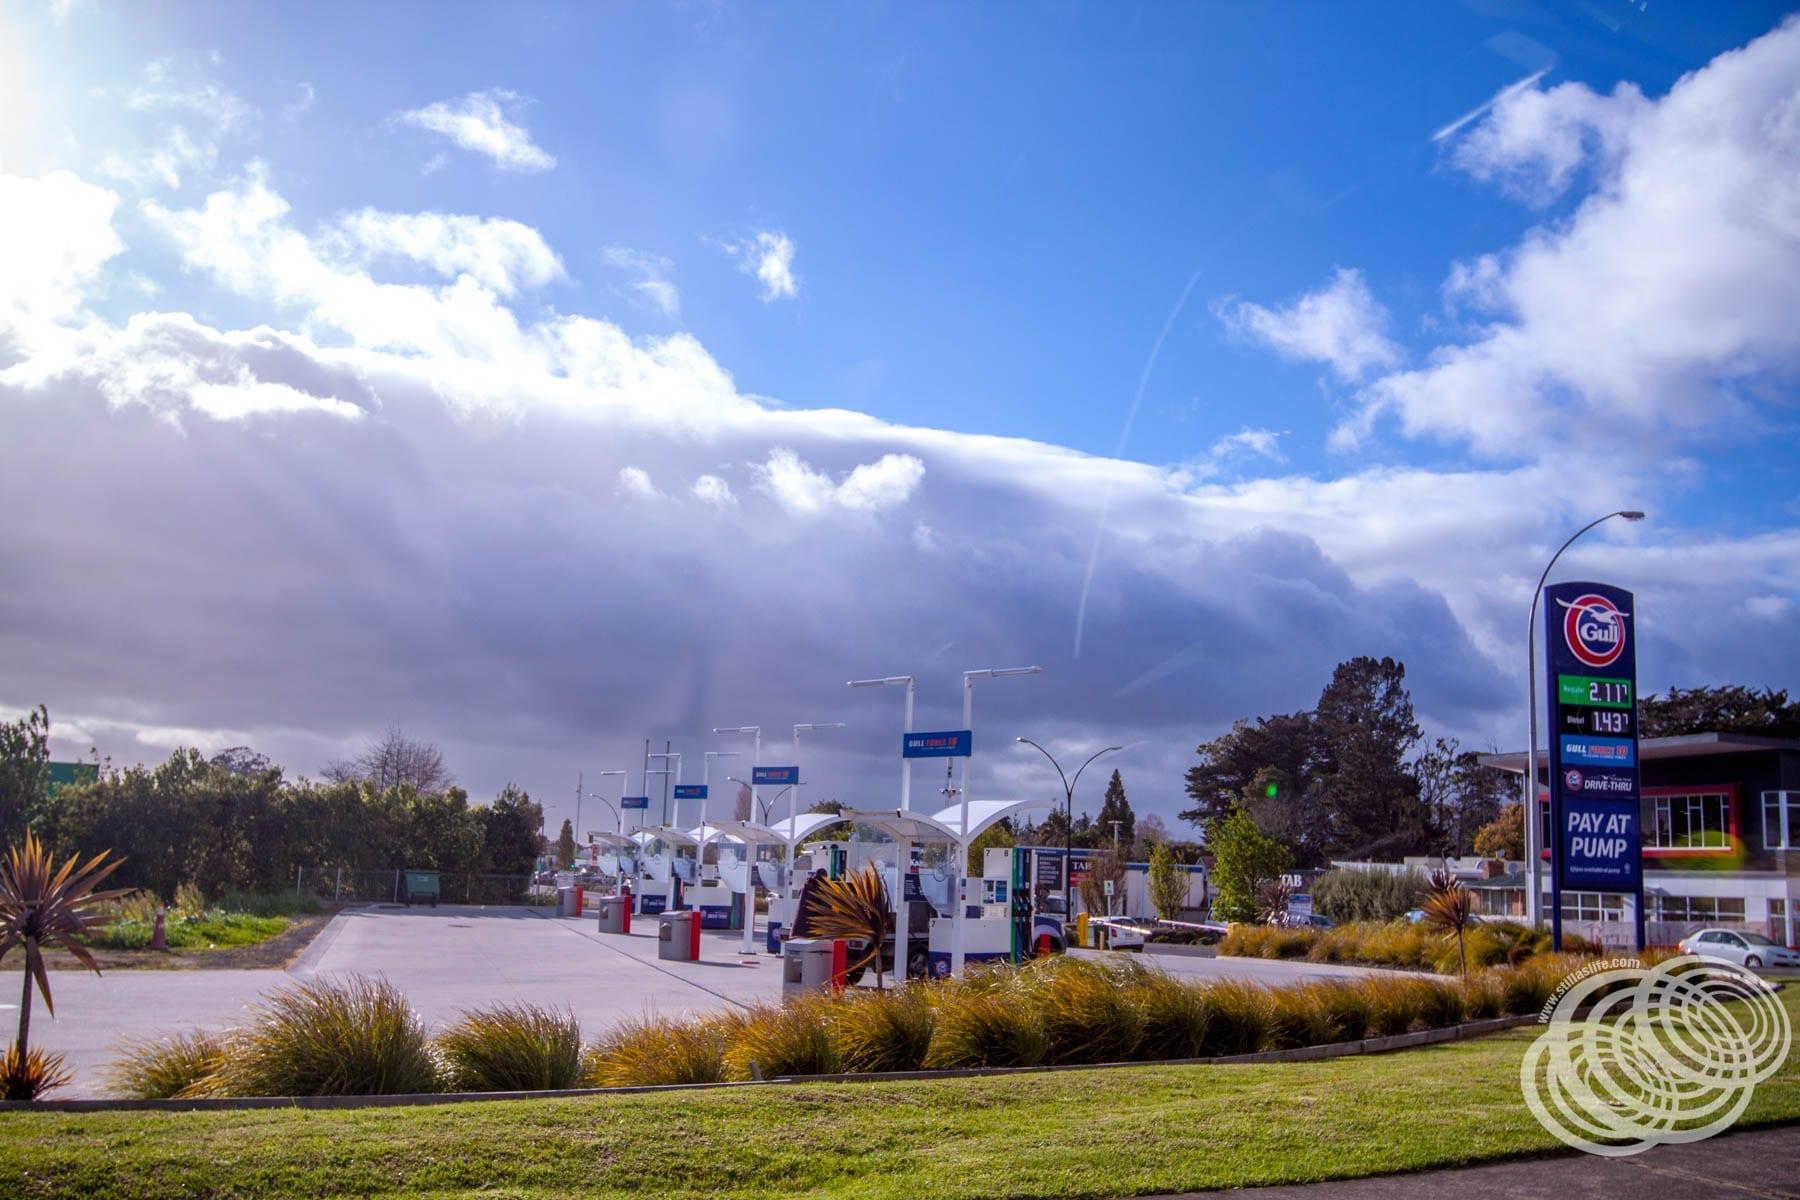 Gull Drive-Thru Service Station in Bethlehem, Tauranga